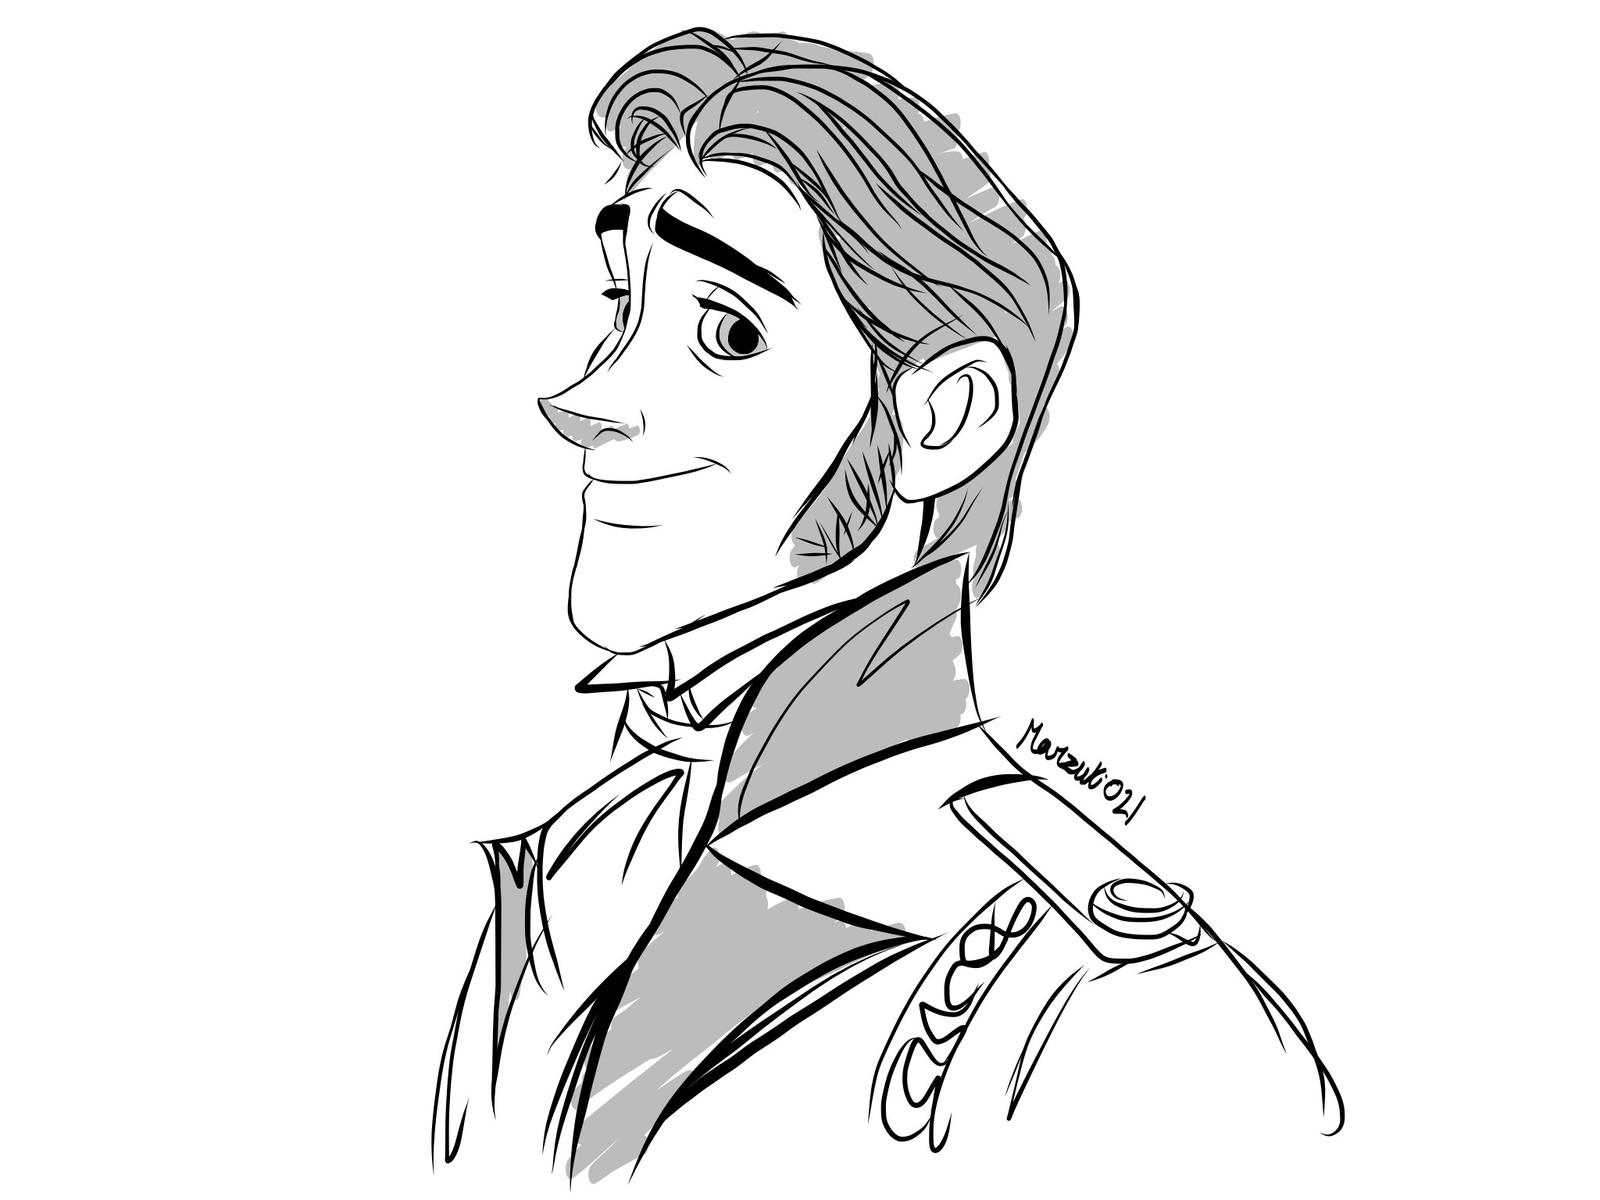 Prince Hans by Ikuzram021 on DeviantArt